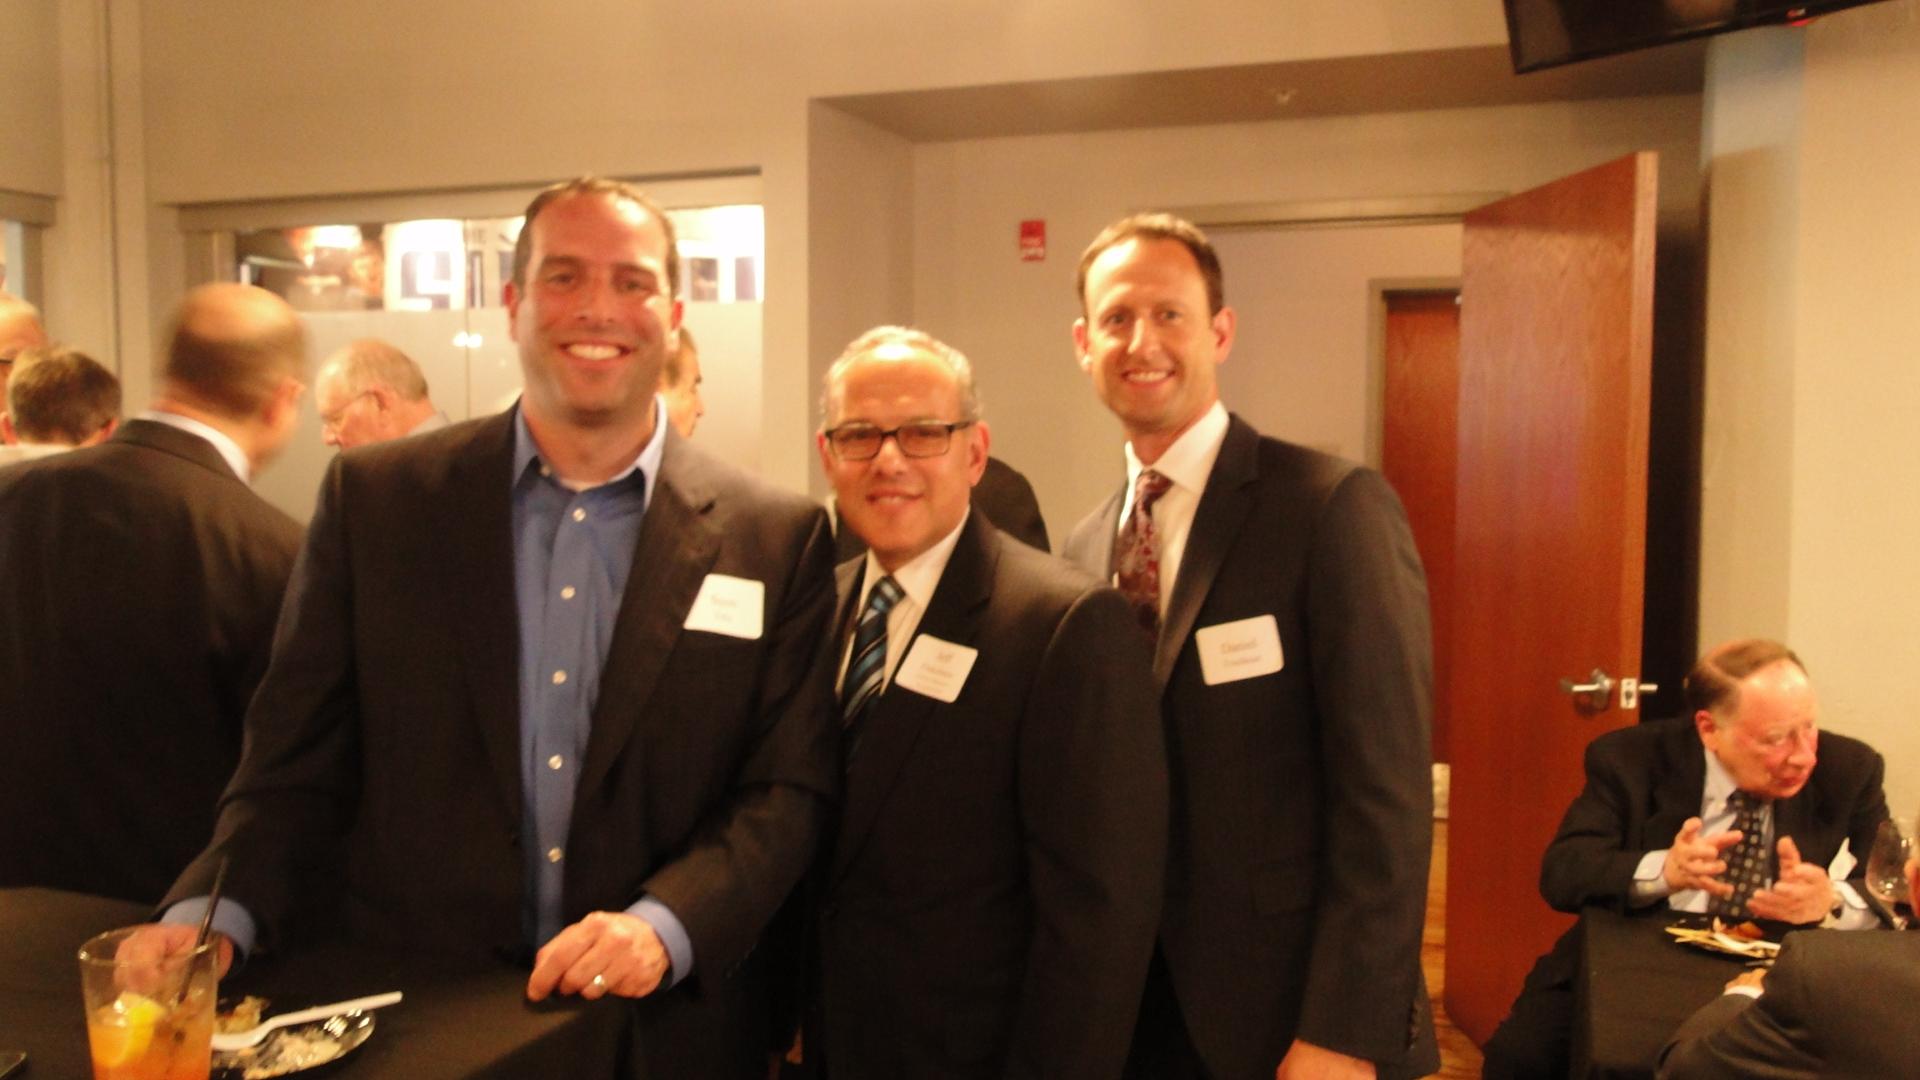 Scott Tobe, Jewish Federation President/CEO Jeff Finkelstein, and Dan Friedman